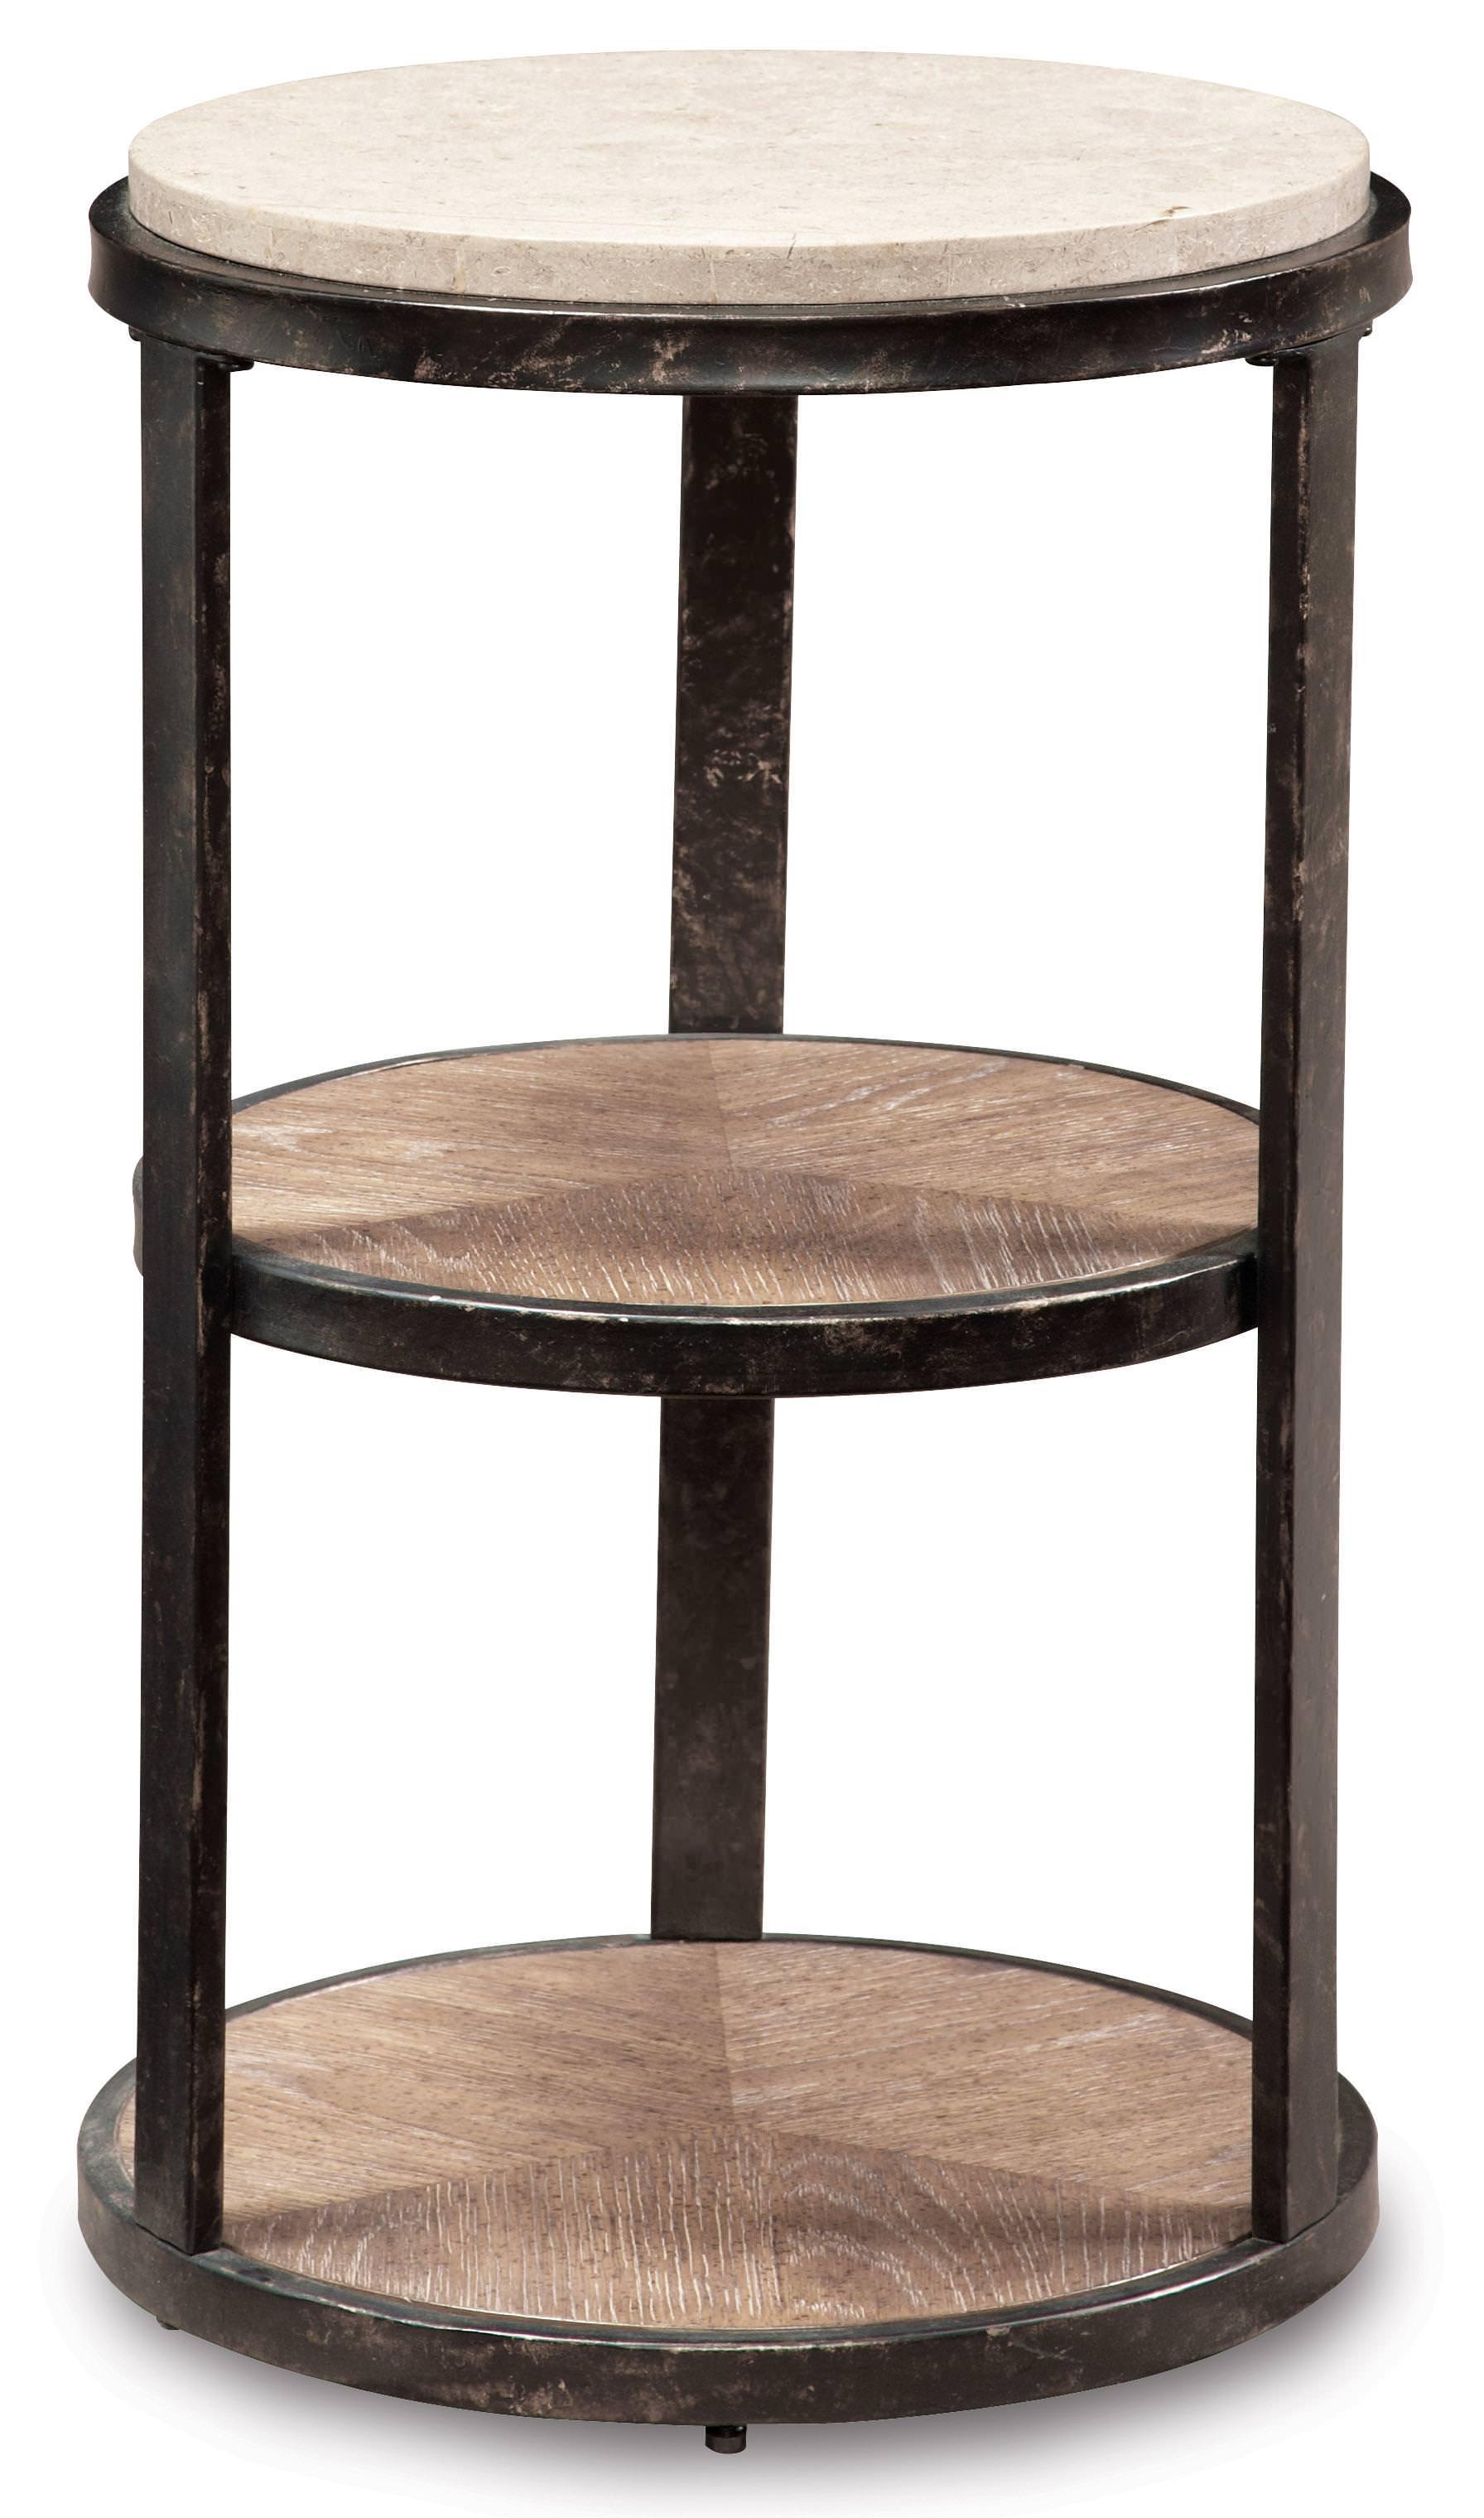 build pedestal accent table khandzoo home decor tables edmonton trestle dining long skinny side bamboo large nightstands blue porcelain lamp retro orange chair oak door threshold